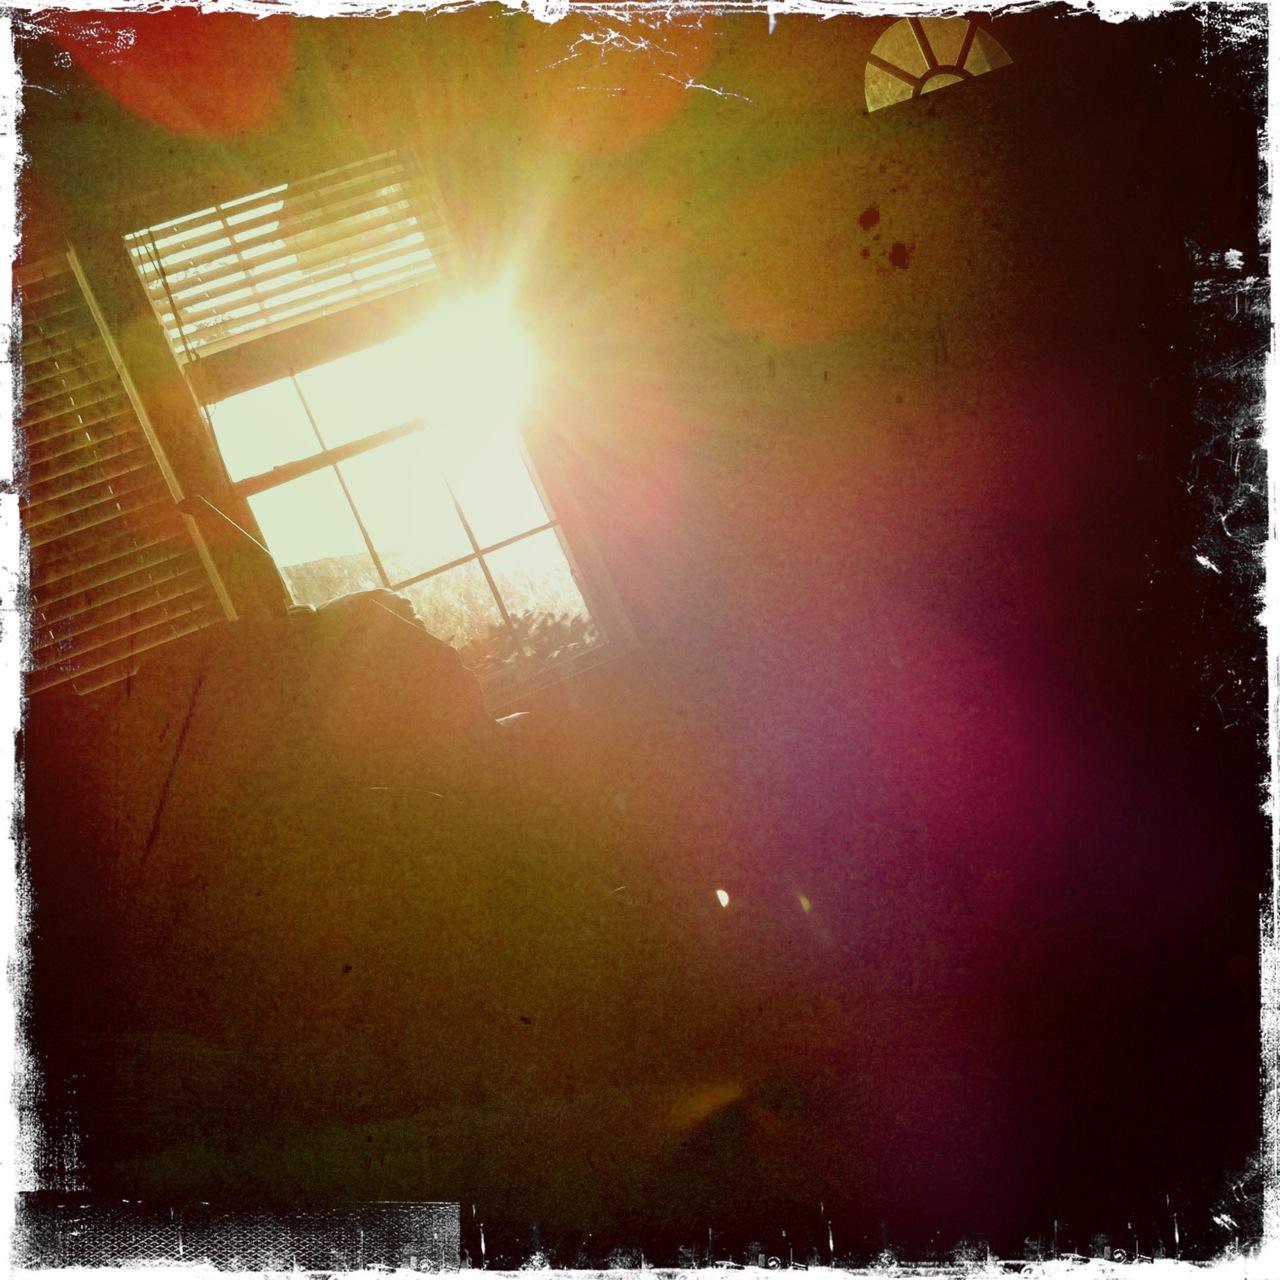 Morning sunrise window 3 Buckhorst H1 Lens, Kodot XGrizzled Film, Dreampop Flash,